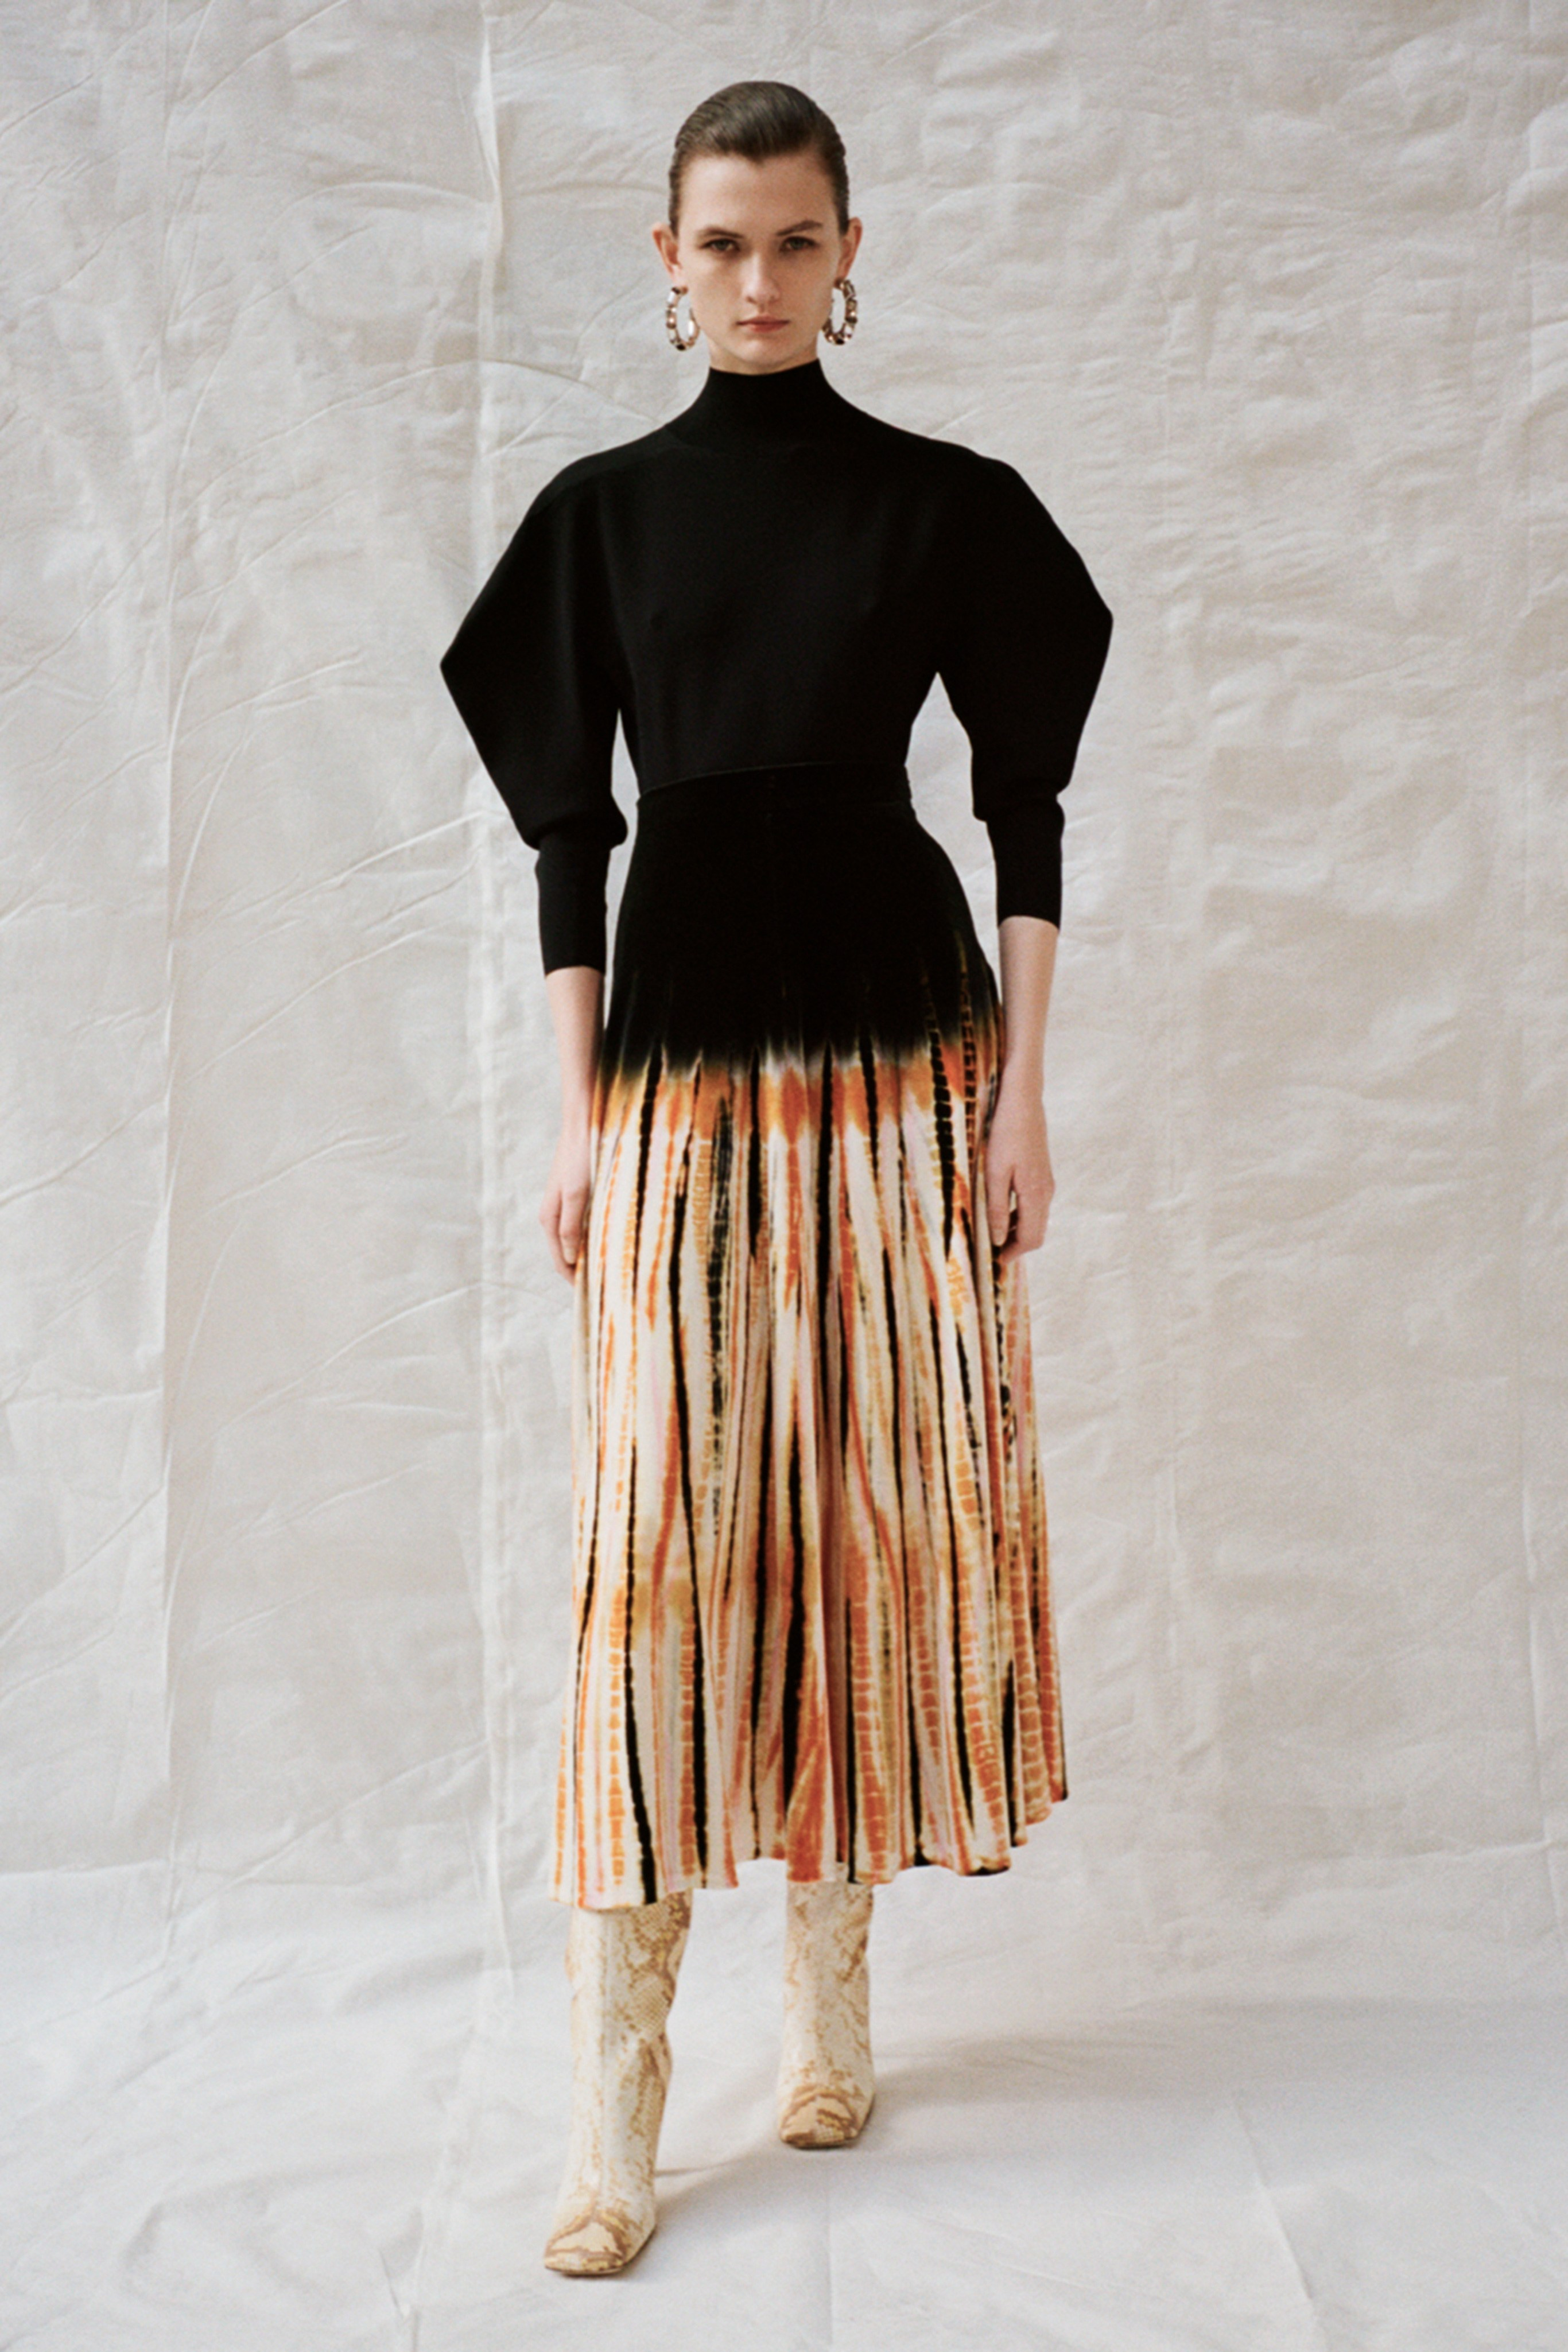 Савхин пиджак, макси юбка болон бусад дурсамж сэргээсэн 2020 оны ретро трендүүд (фото 9)